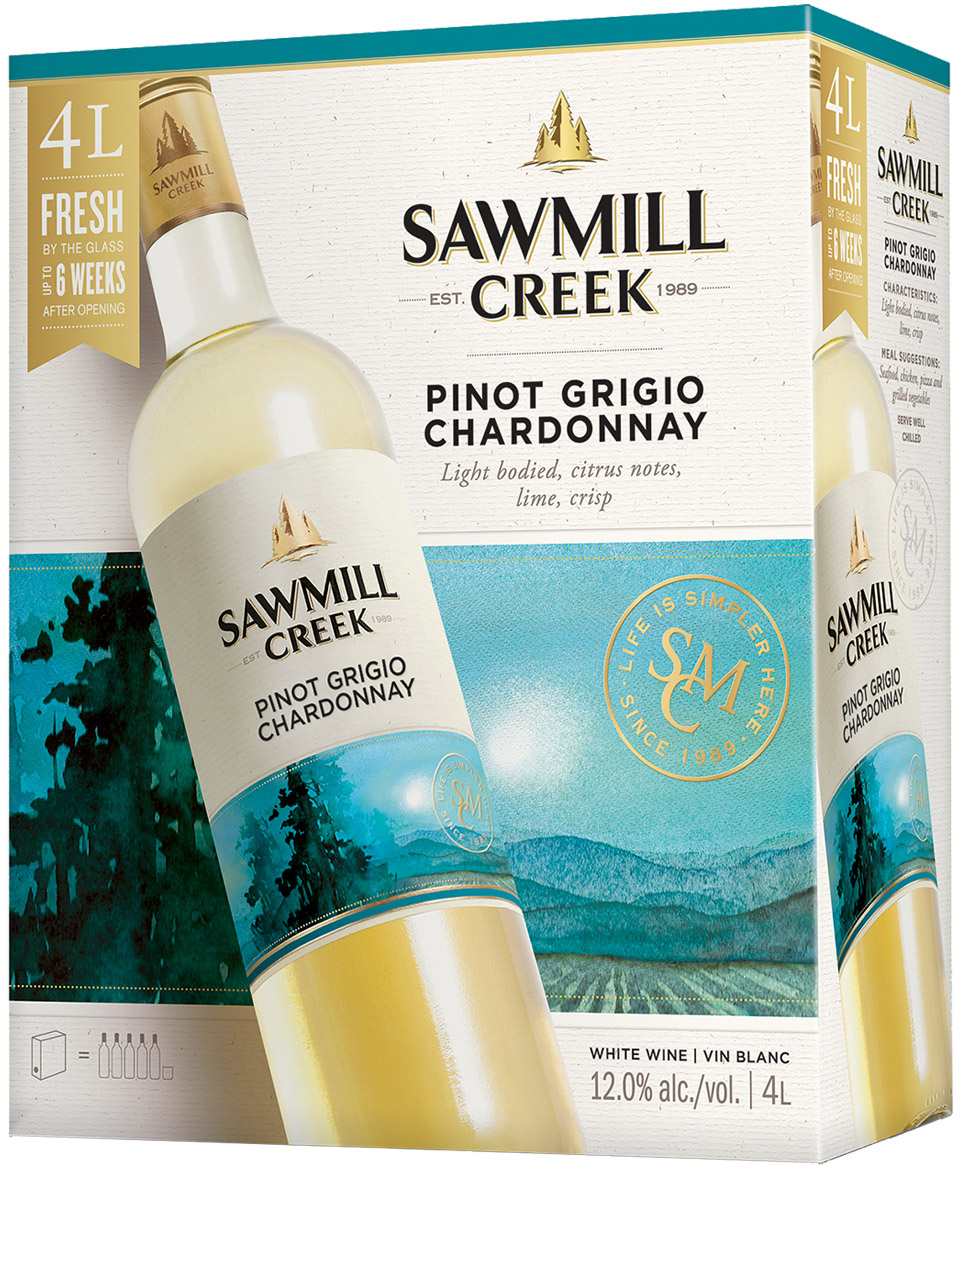 Sawmill Creek Pinot Grigio Chardonnay